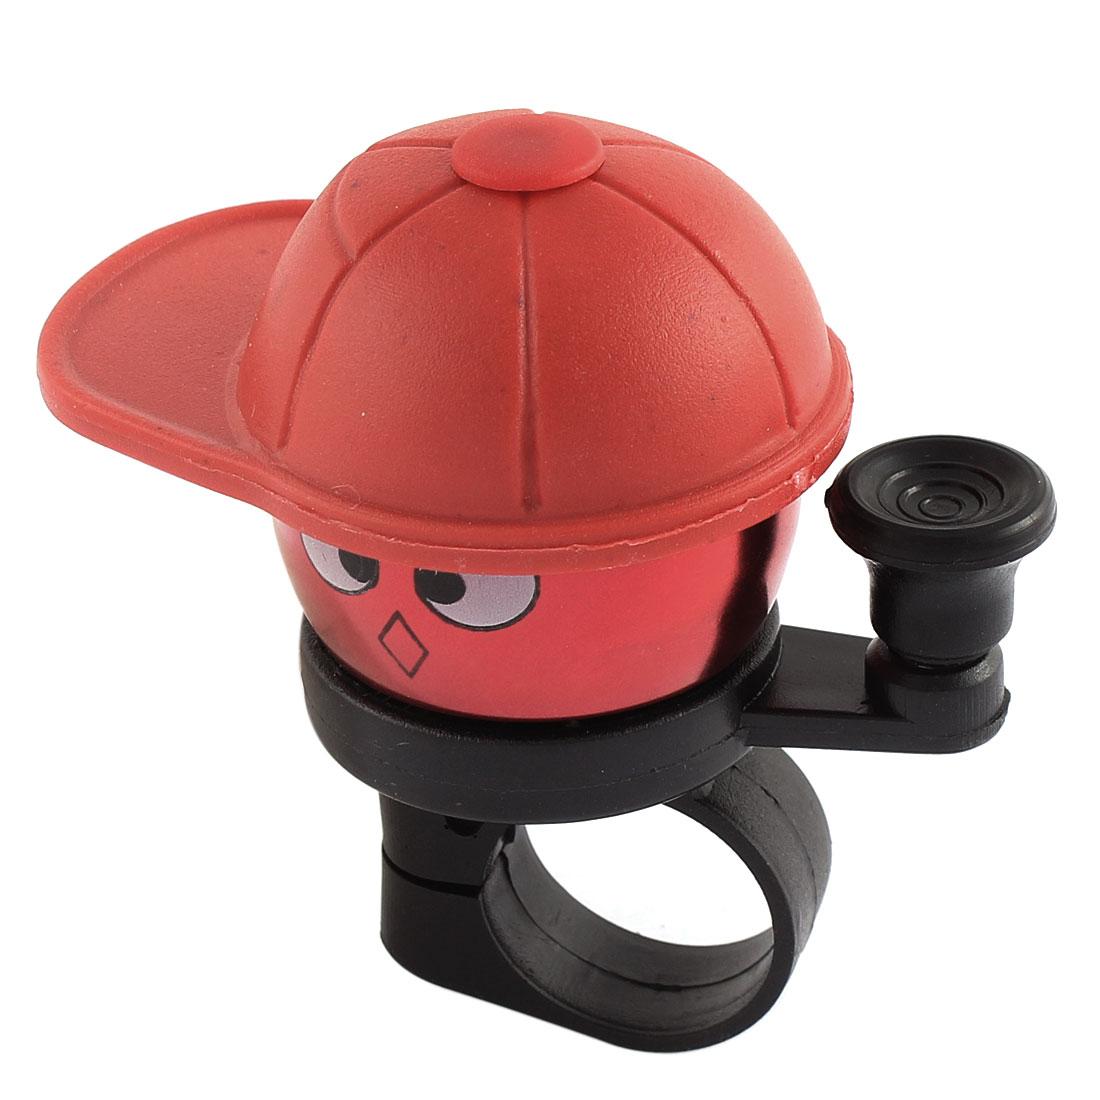 21mm Dia Red Cartoon Boy Design Bicycle Cycling Handlebar Bell Ring